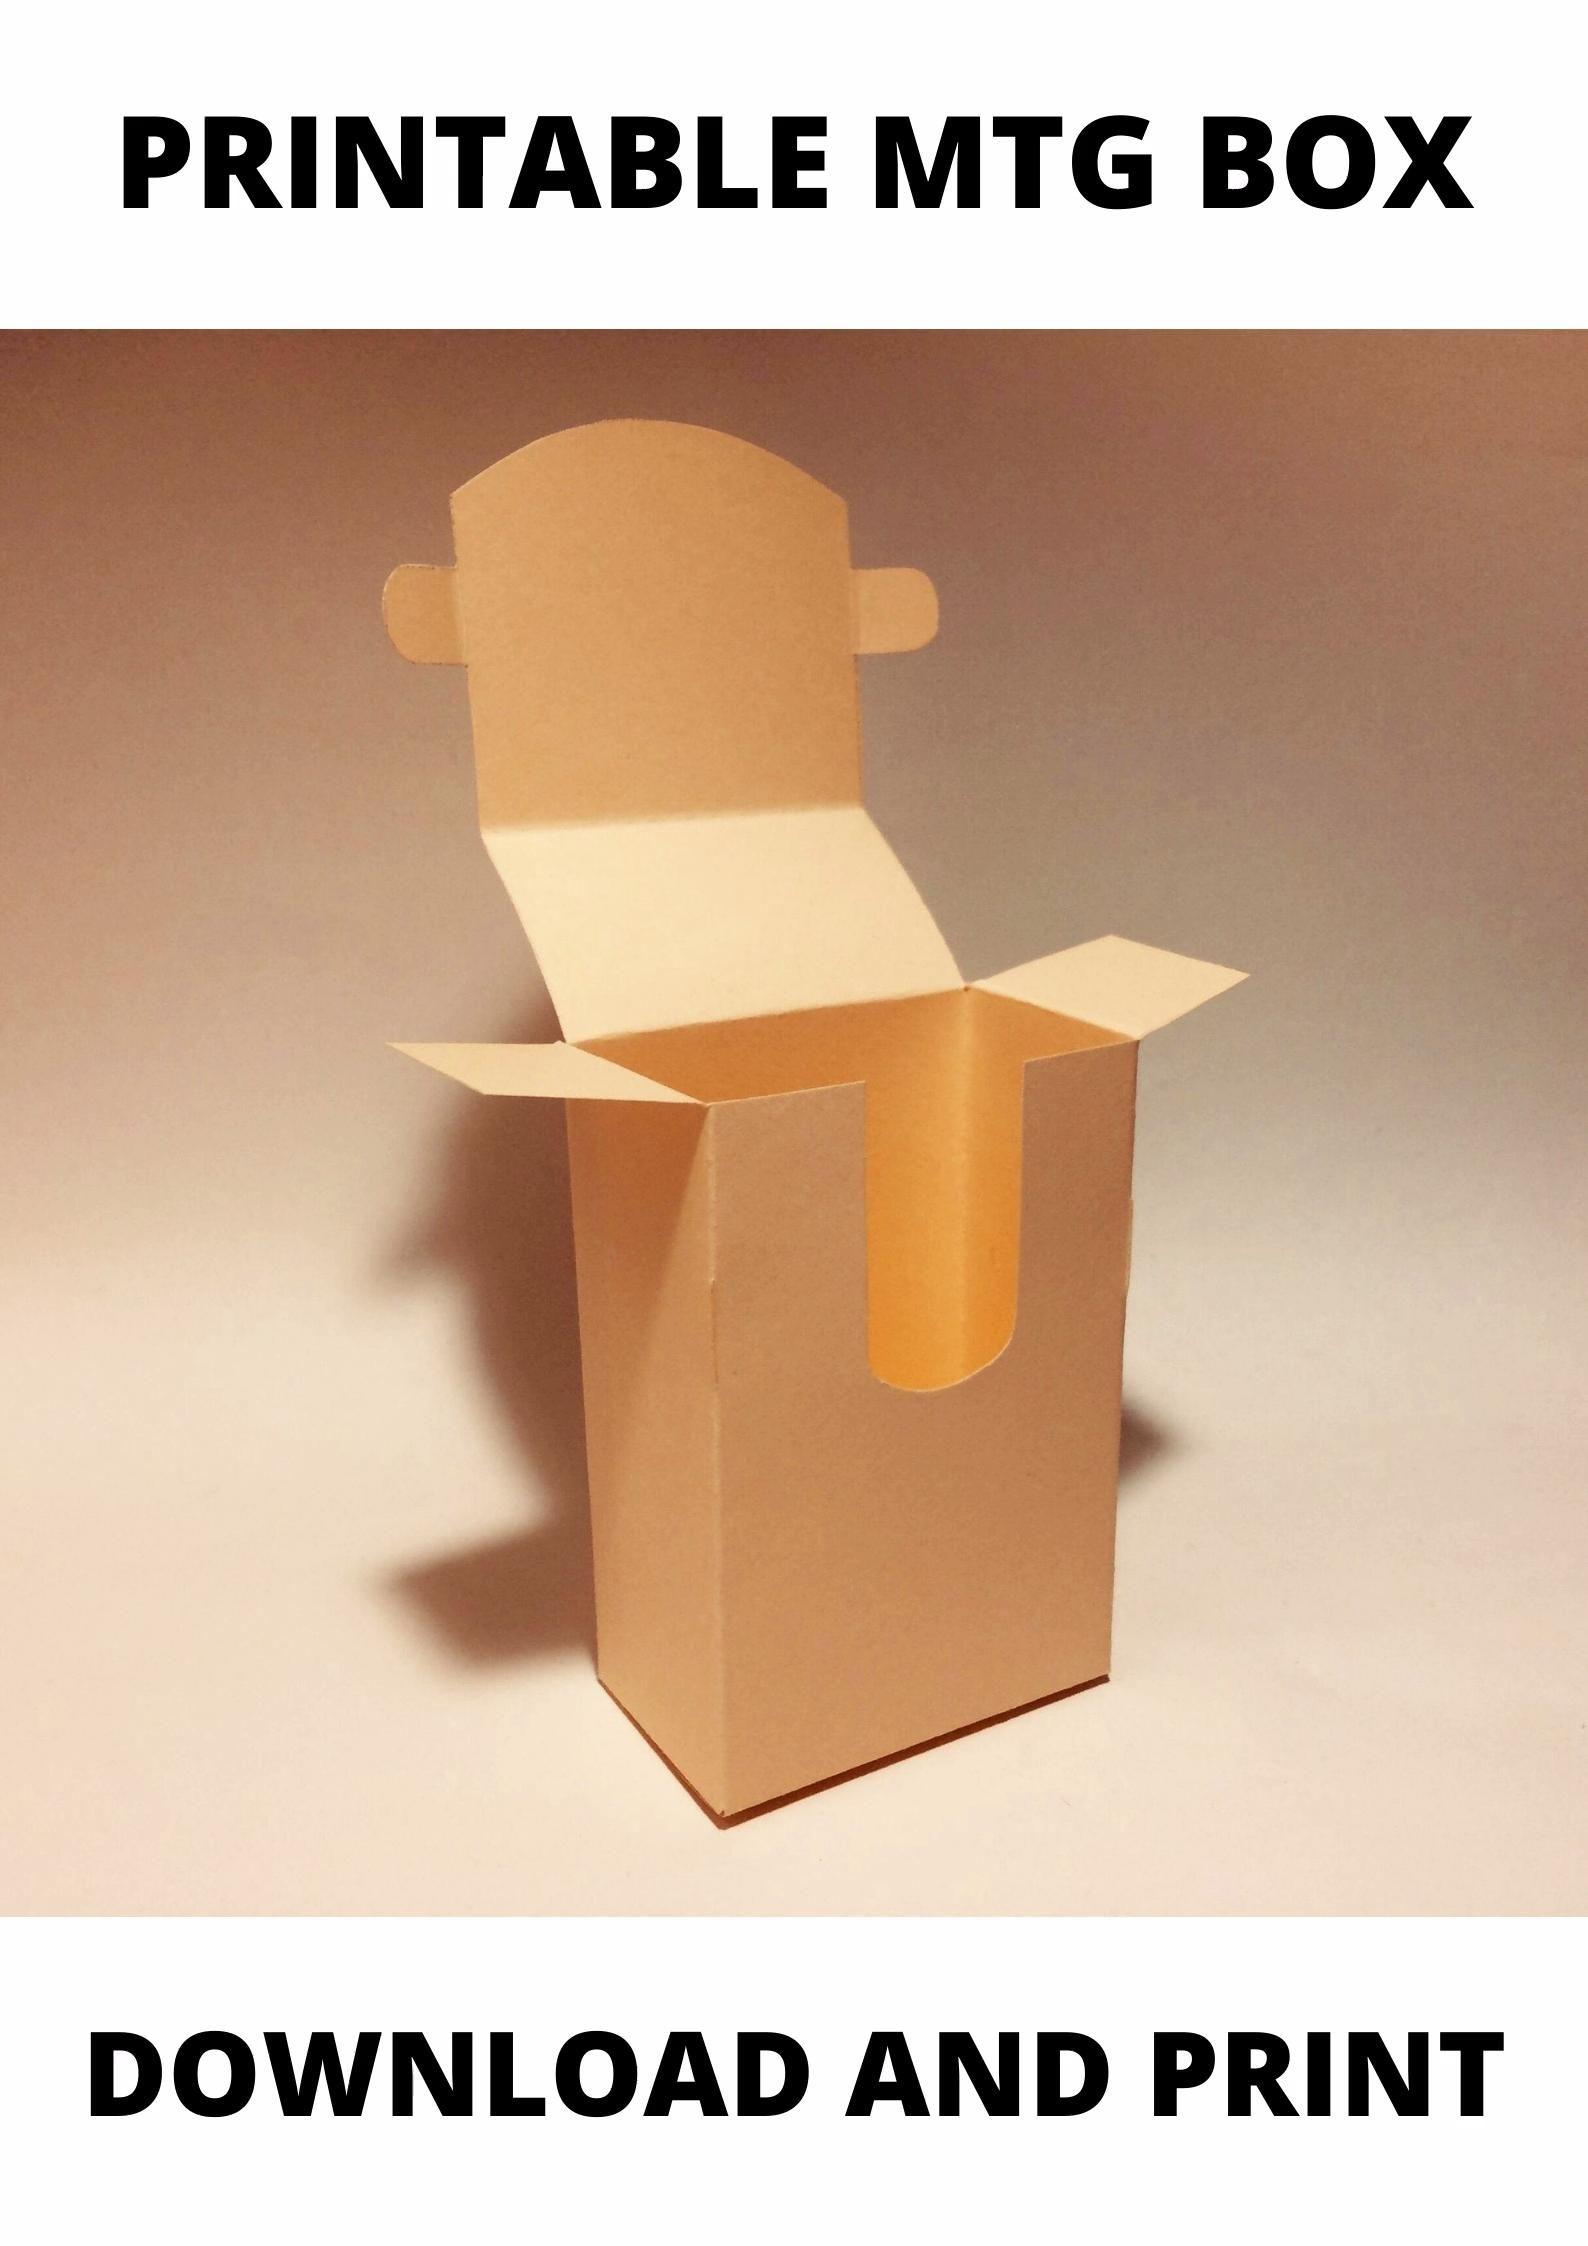 Mtg Deck Box Mtg Box Magic The Gathering Deck Box Mtg Card Box Mtg Card Storage Box 8 5x11 A4 A3 Svg Pdf Cricut Silhouette Video Video Diy Playing Cards Card Holder Diy Card Storage